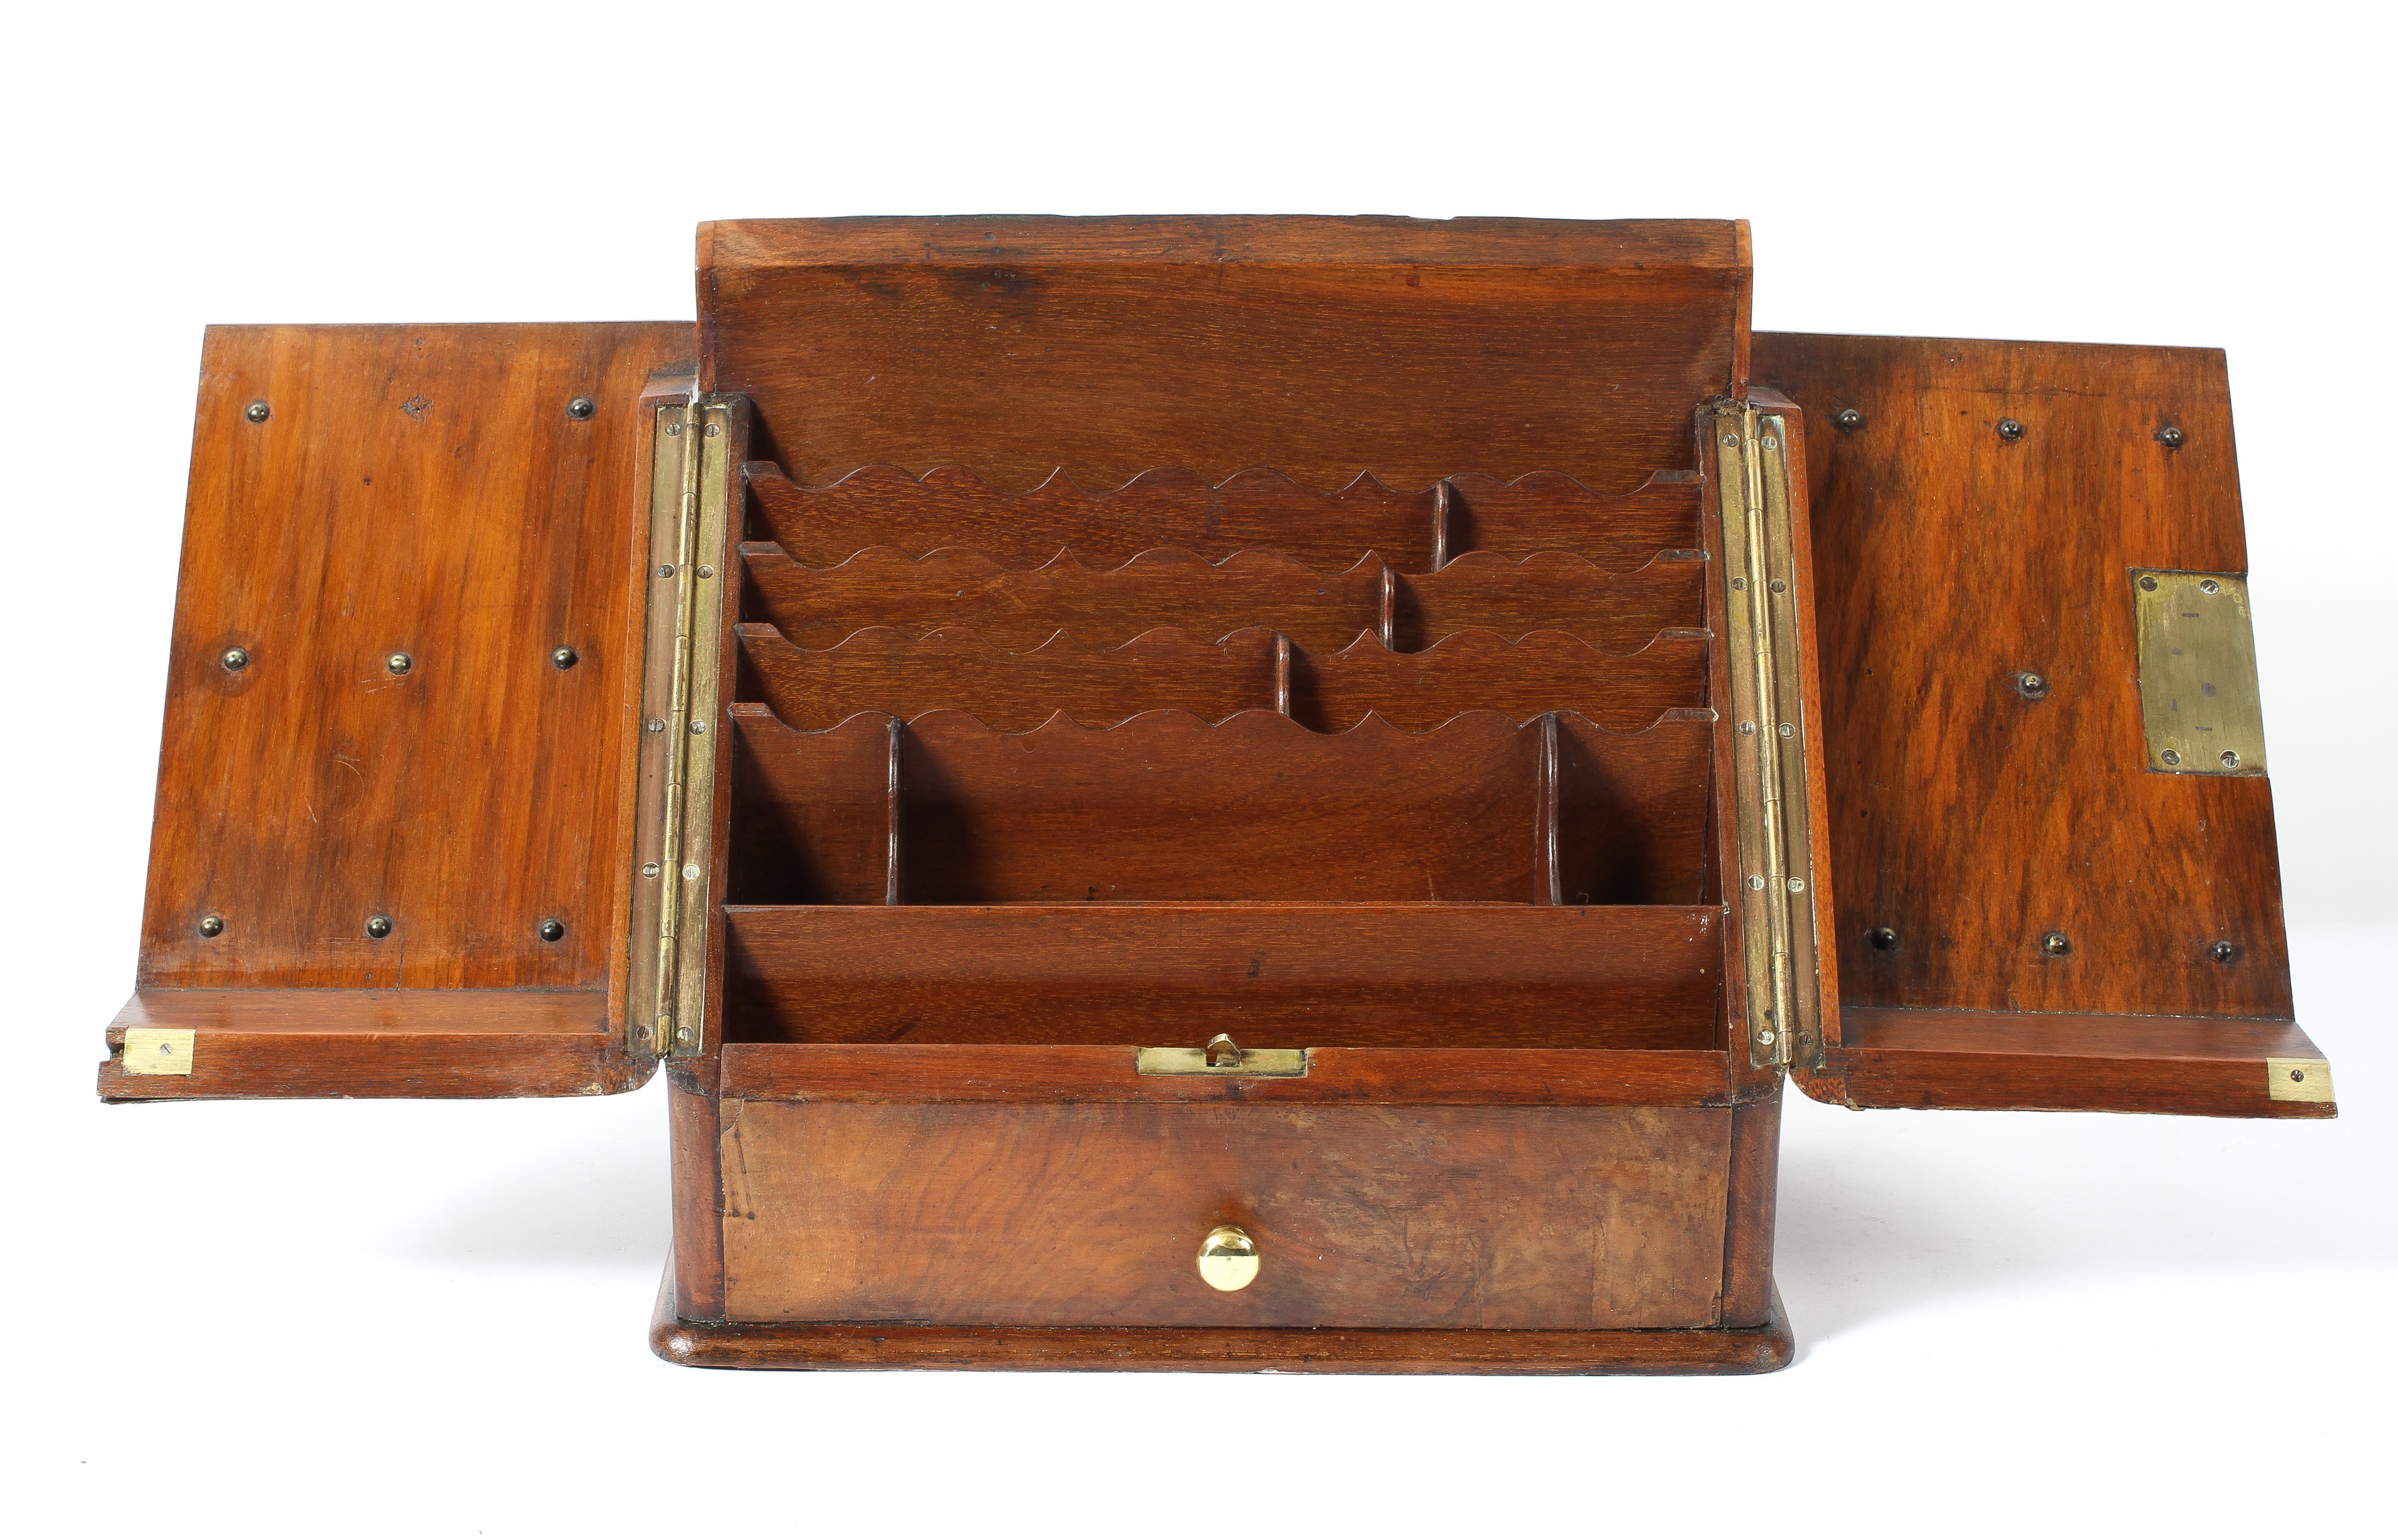 An Edwardian walnut stationery cabinet, - Image 2 of 2